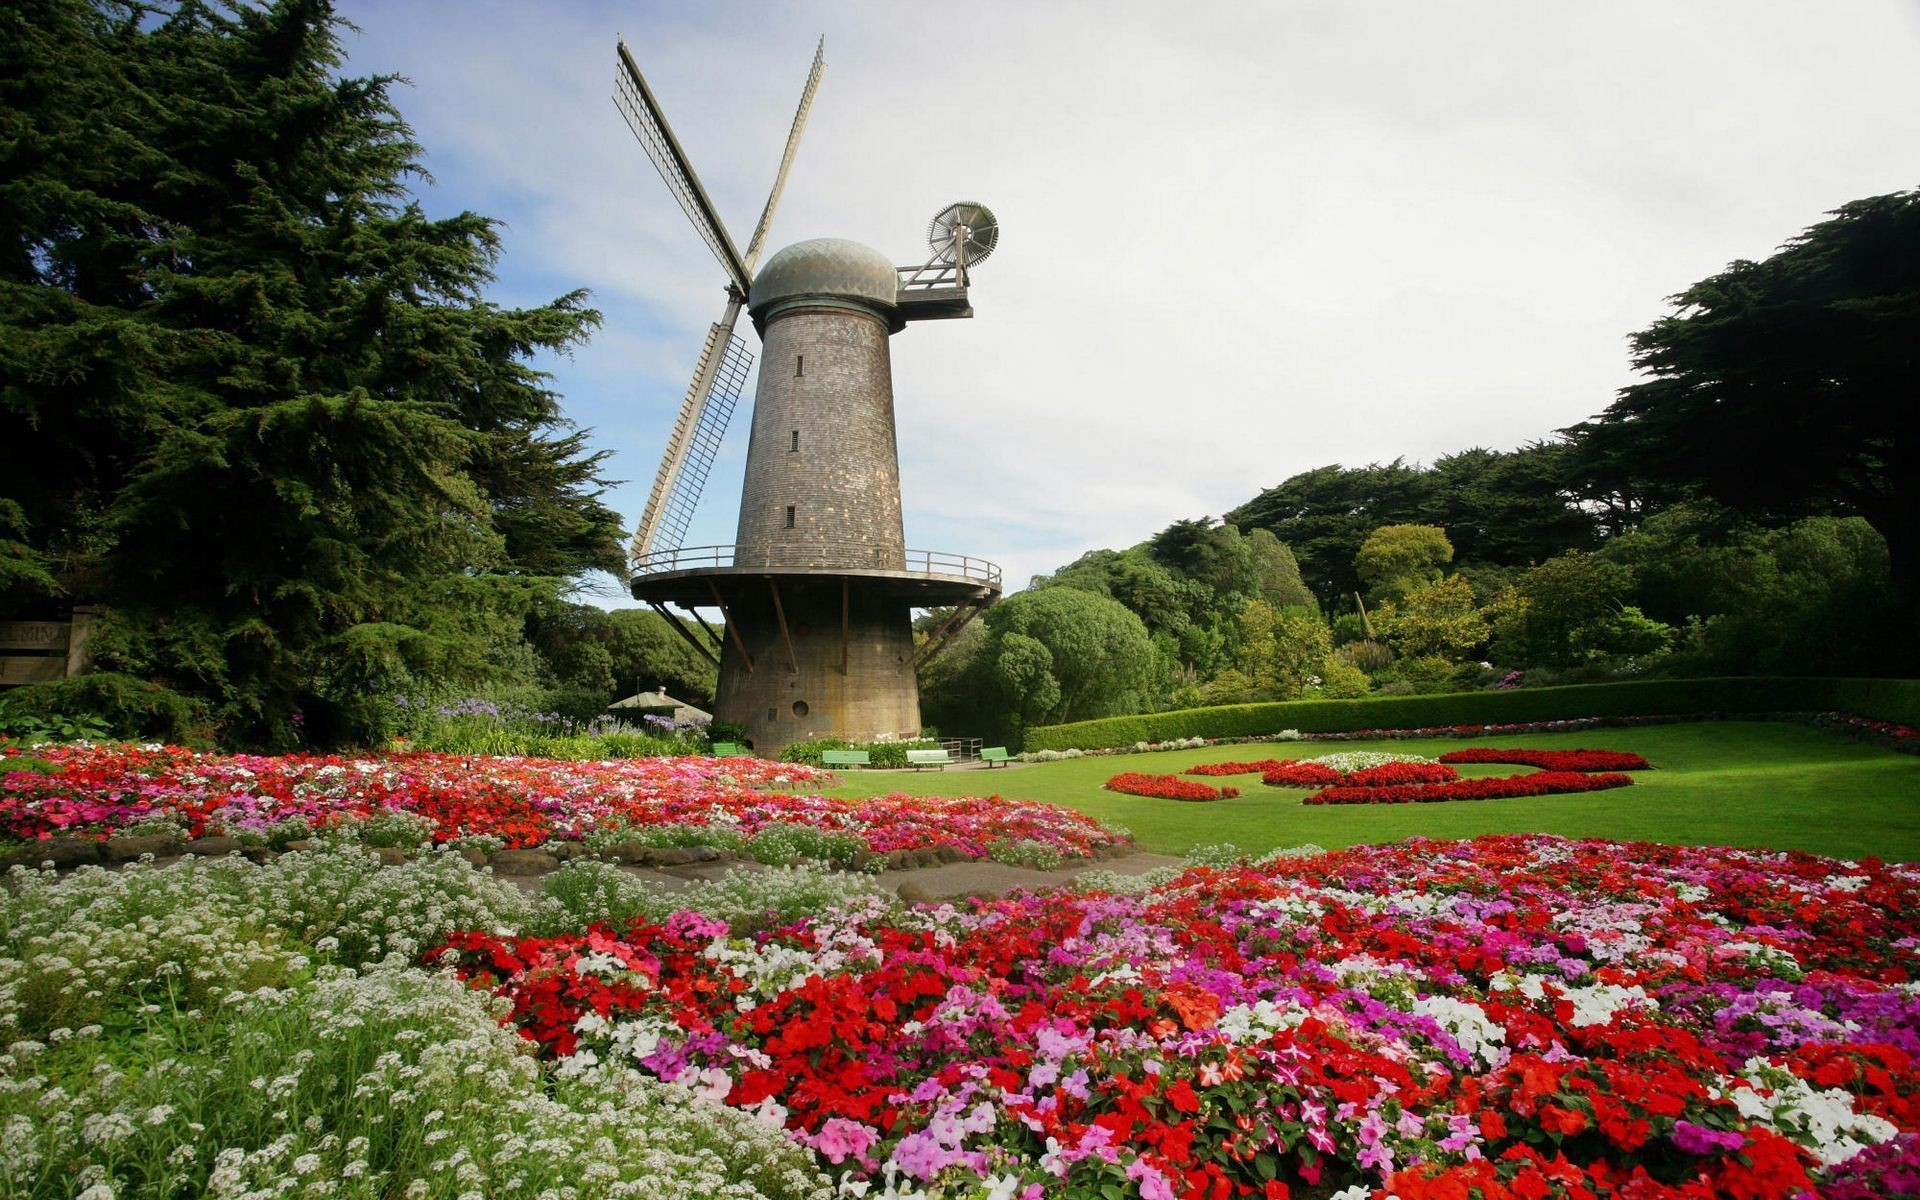 North Dutch Windmill and Queen Wilhelmina Tulip Gardens, Golden Gate Park,  San Francisco, California Widescreen Wallpaper